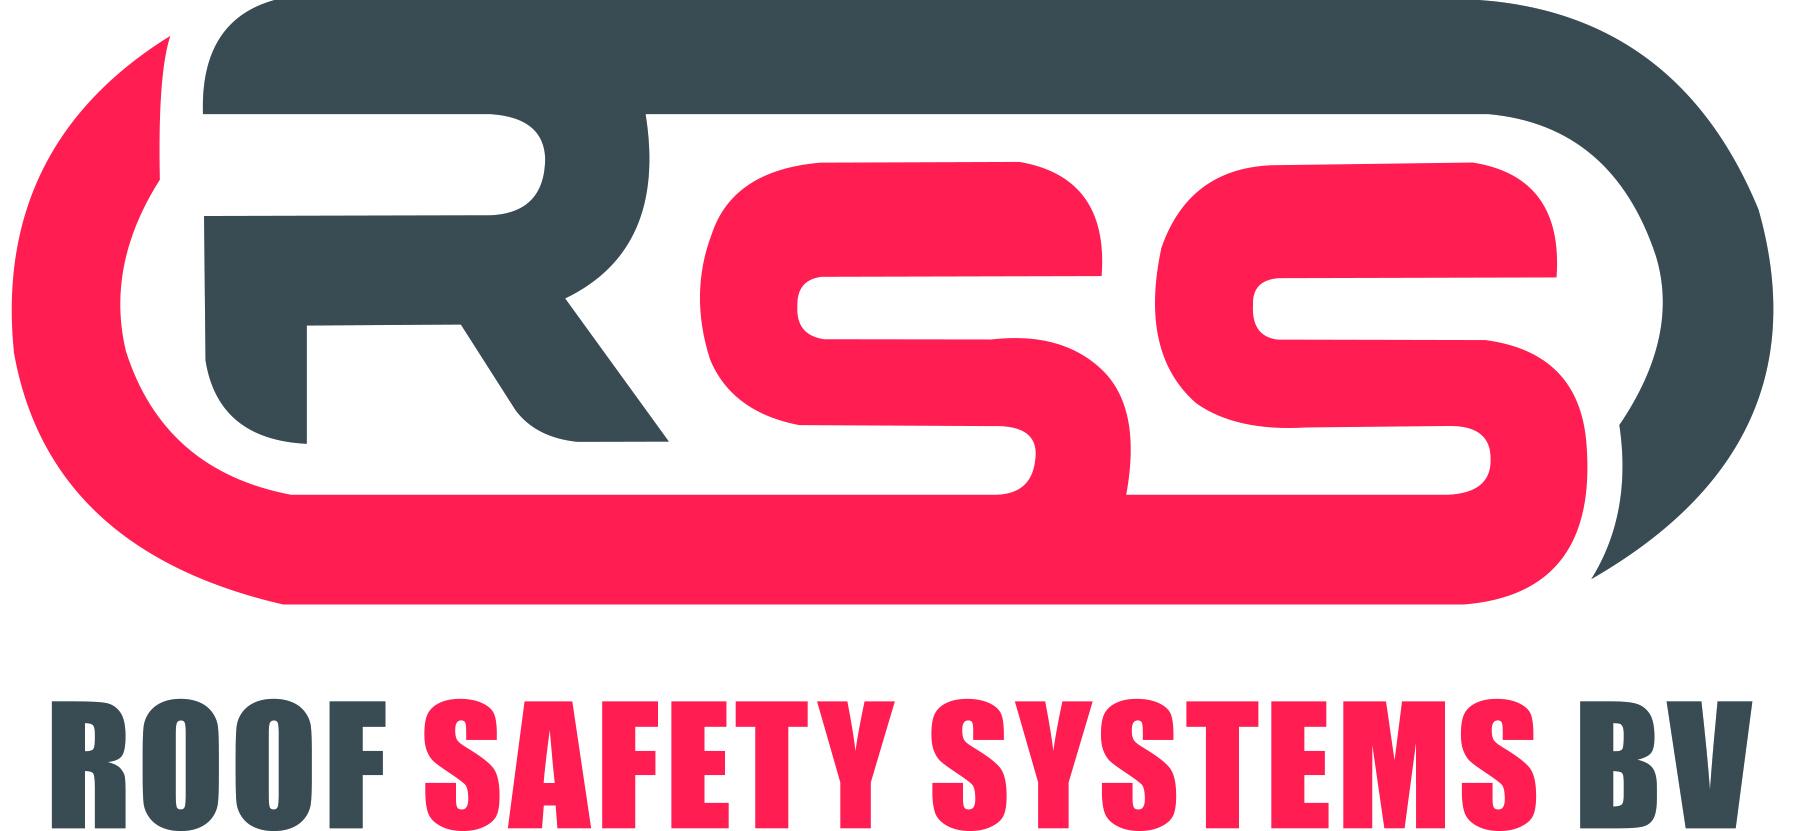 RSS_Roof.jpg